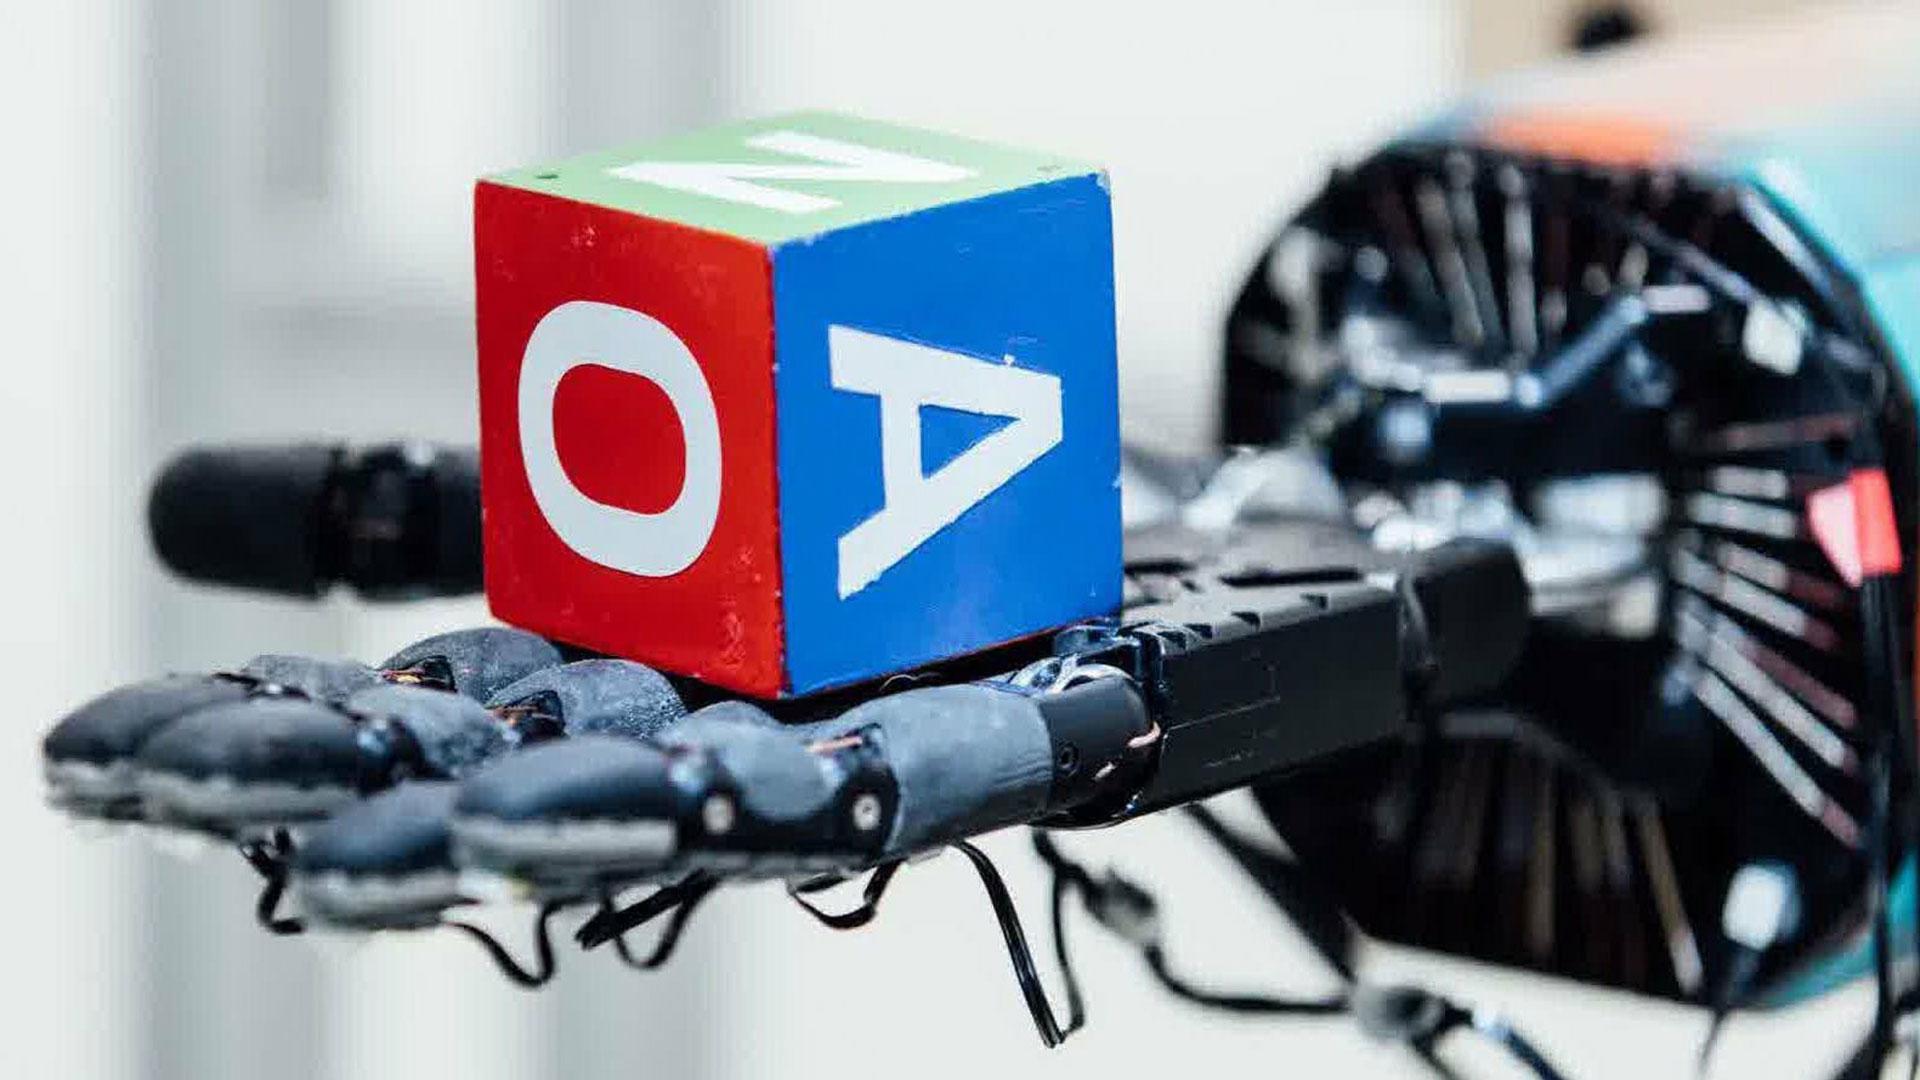 El robot Dactyl aprendió a manipular un cubo de juguete con destreza